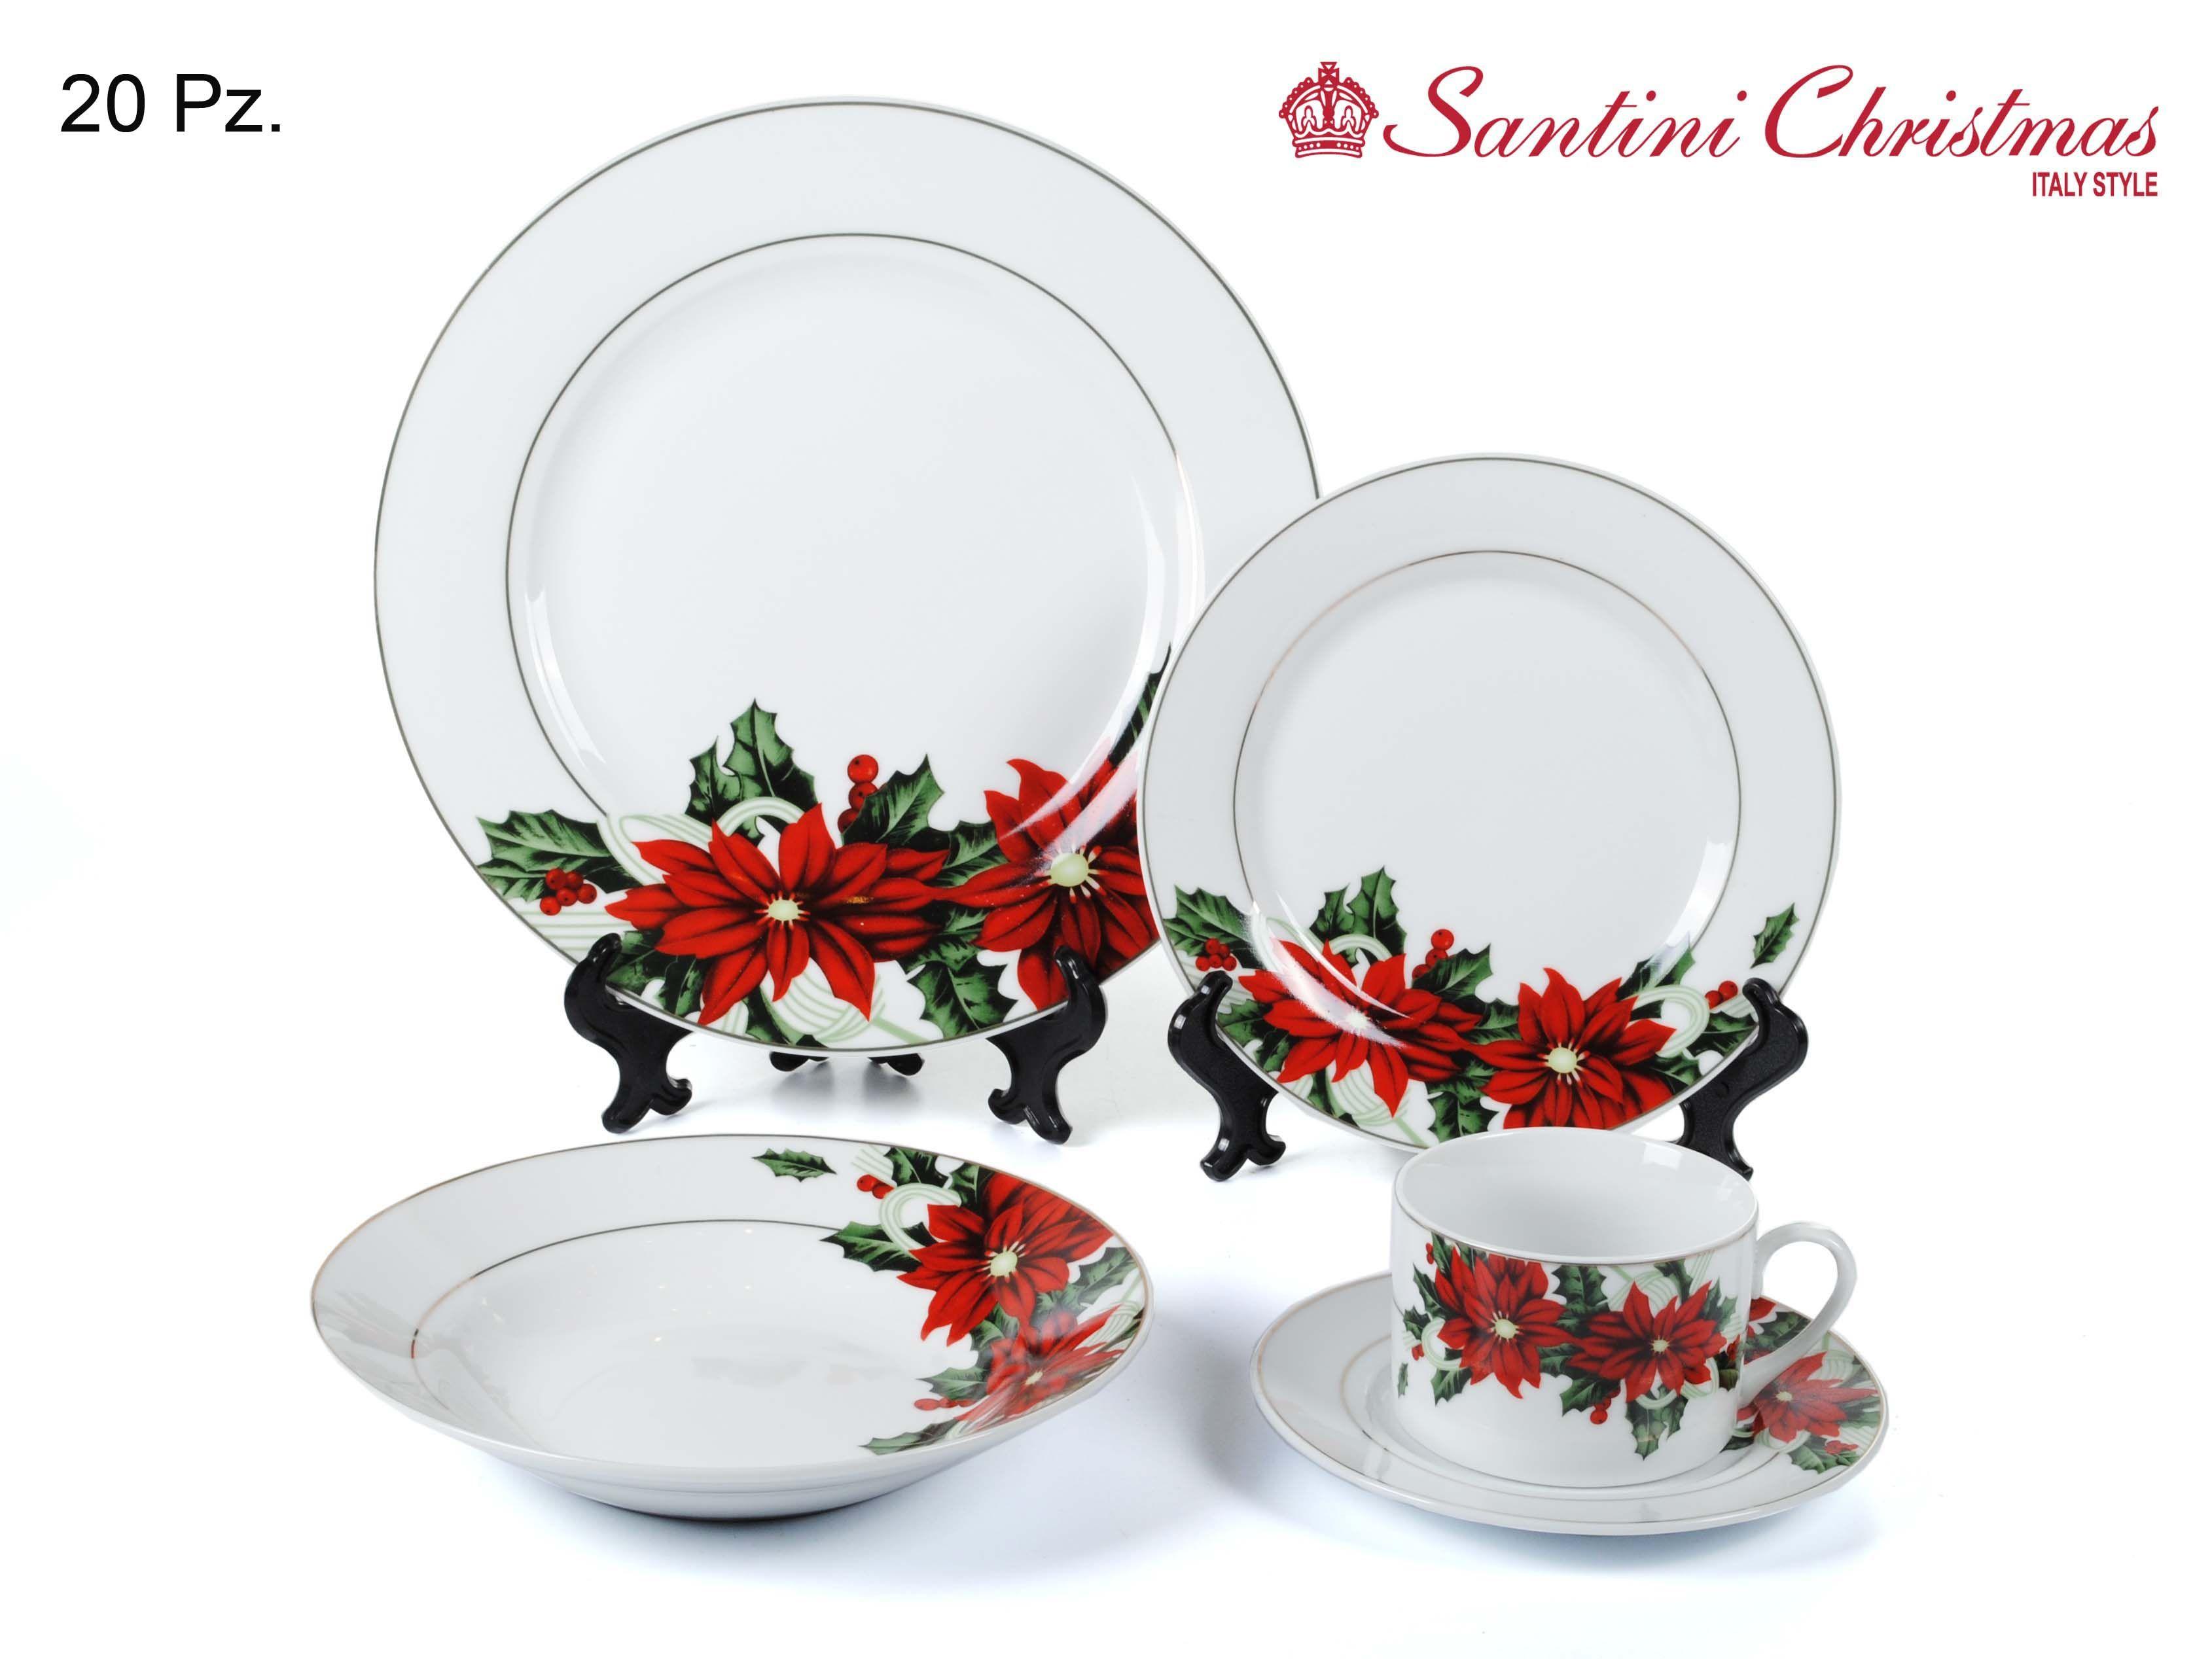 Vajilla de Poinsetia / Poinsettia Dinnerware Set  sc 1 st  Pinterest & Vajilla de Poinsetia / Poinsettia Dinnerware Set   Christmas ...